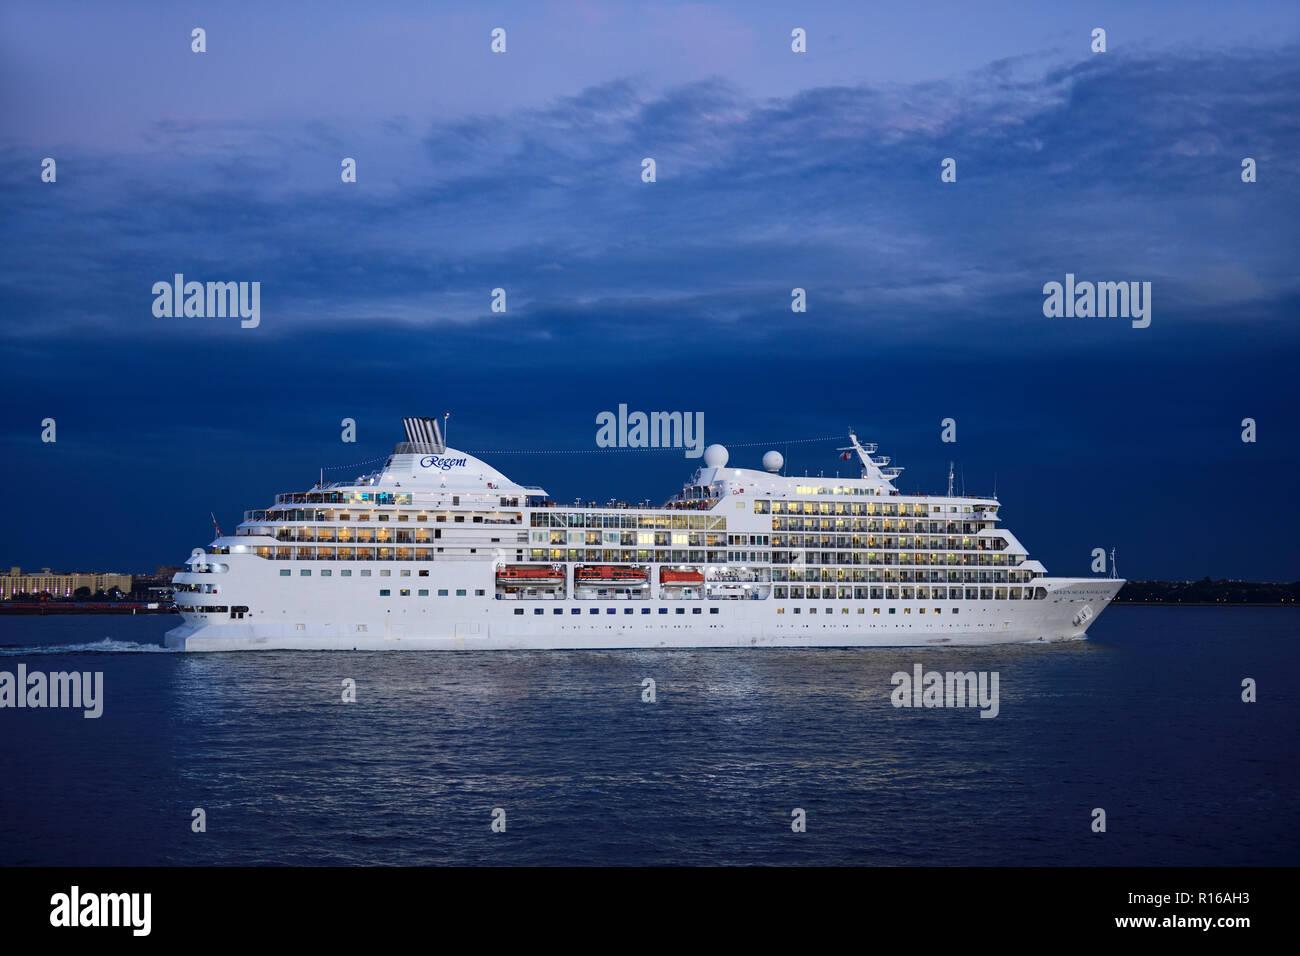 Cruise ship Seven Seas Navigator of the Regent Line leaves the East River, Manhattan, New York City, USA - Stock Image